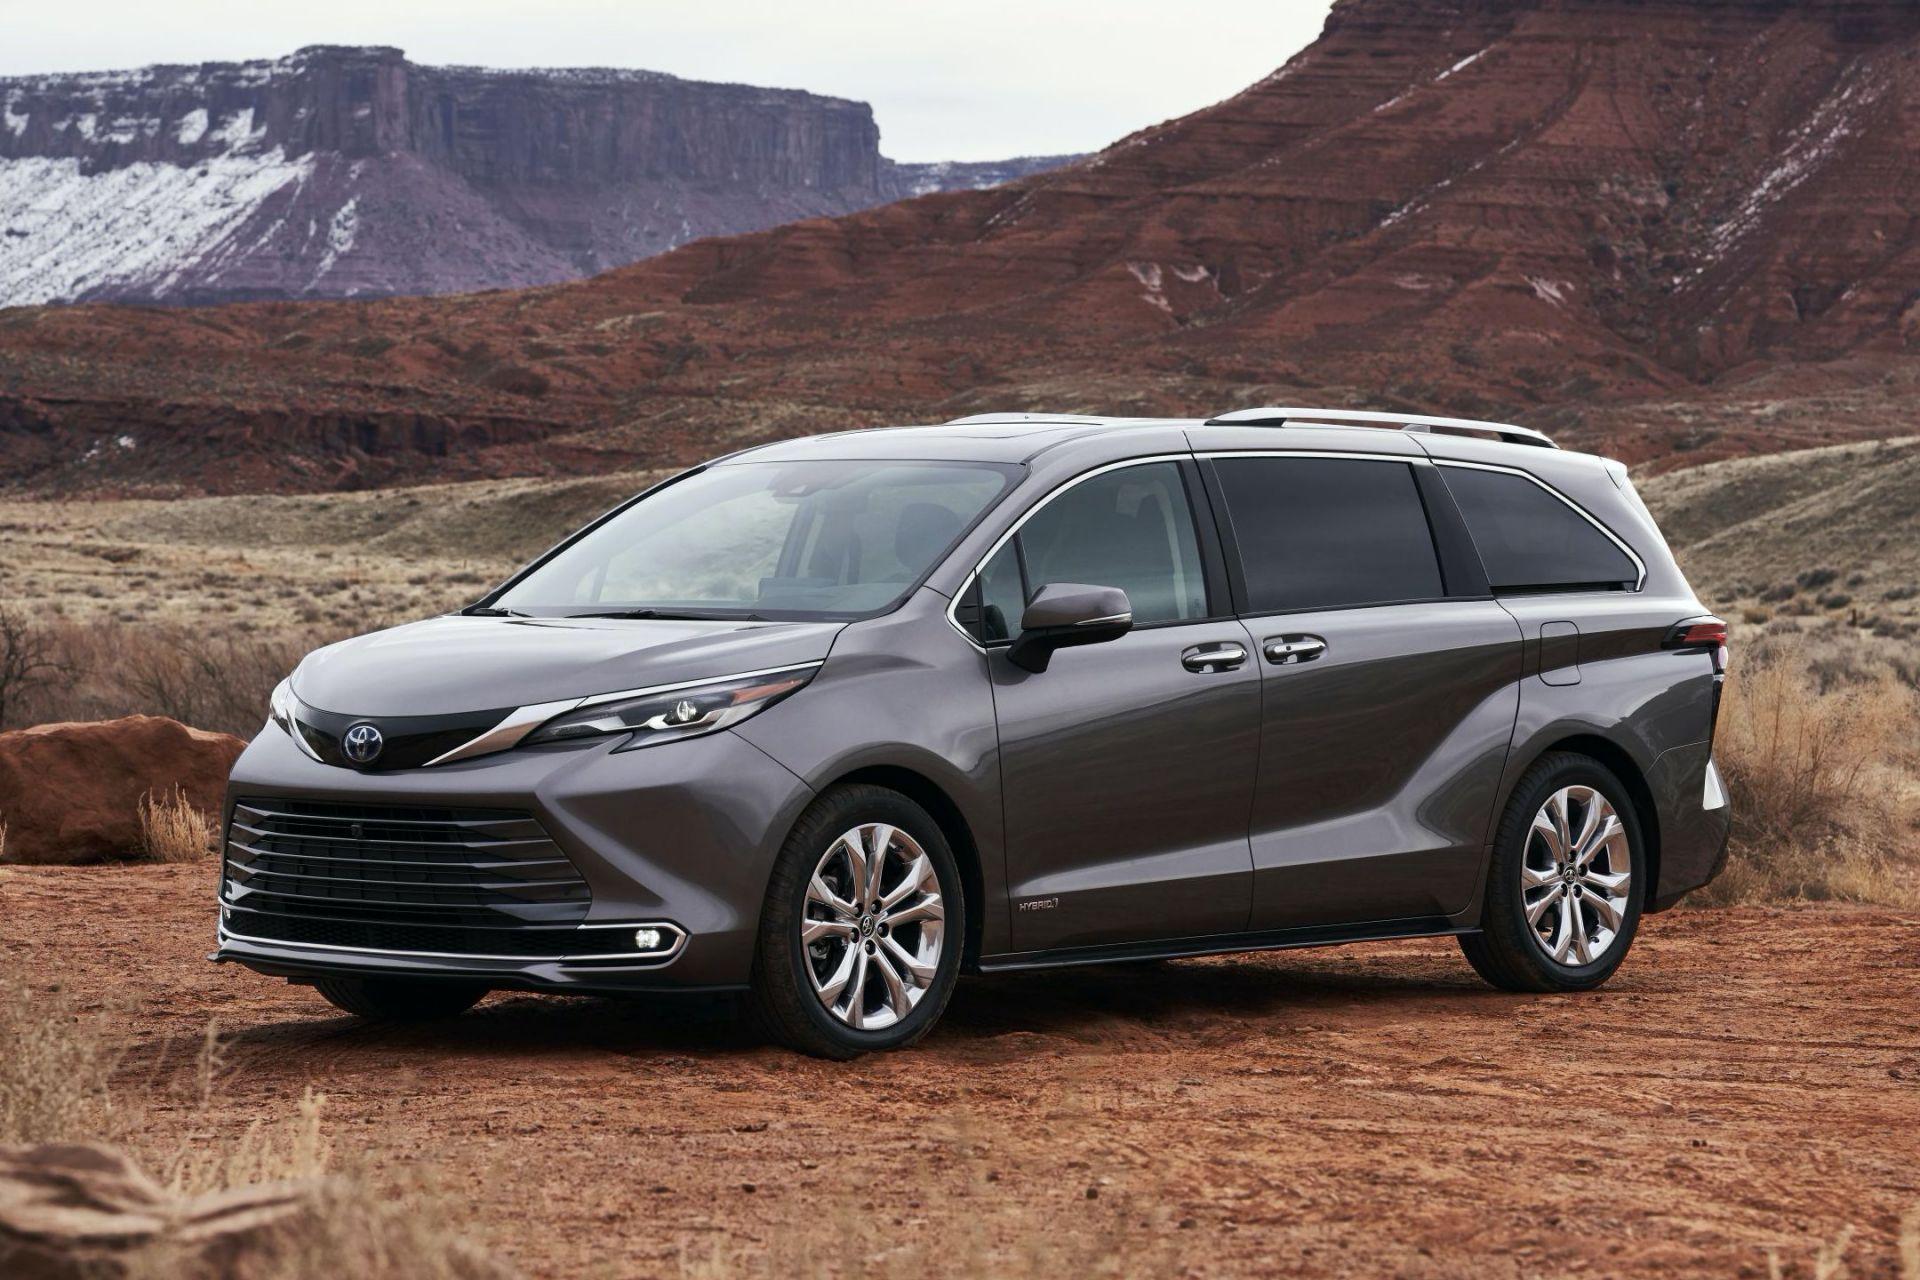 2021 toyota sienna unveiled as bold new hybrid minivan